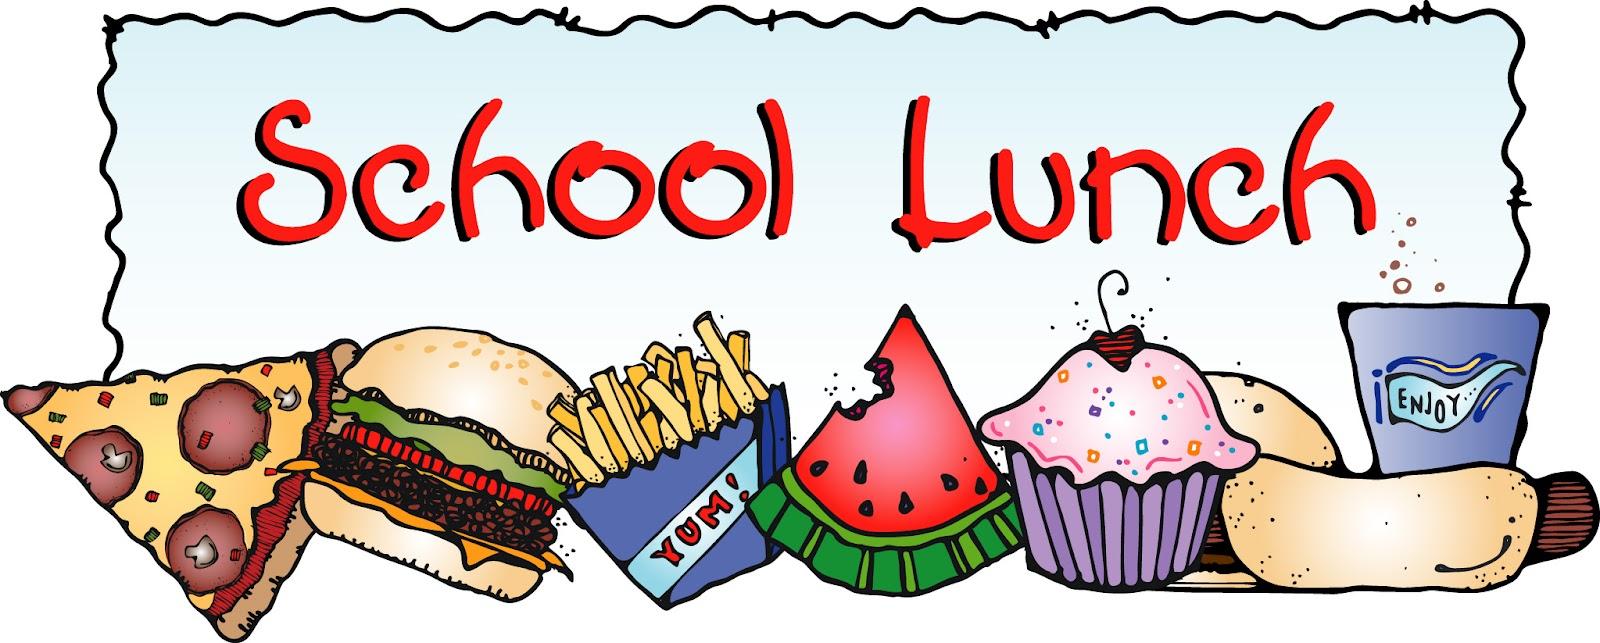 Lunch kindergarten clipart graphic free library Buying lunch clip art - ClipartFest graphic free library